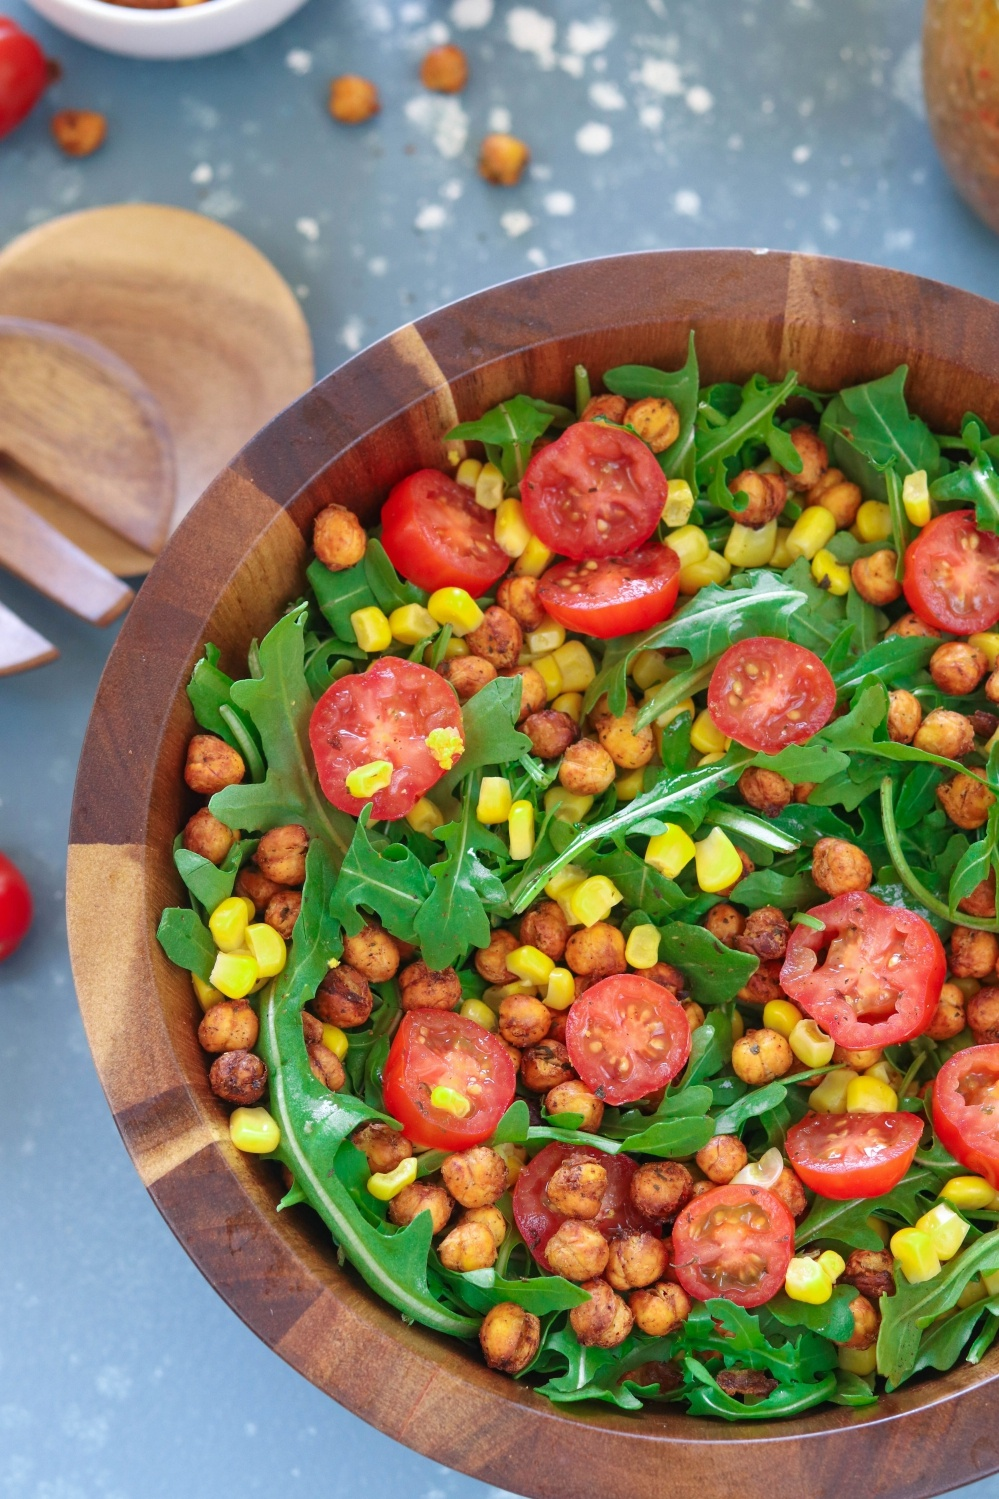 Roasted Chickpea And Arugula Salad | Ruchiskitchen.com